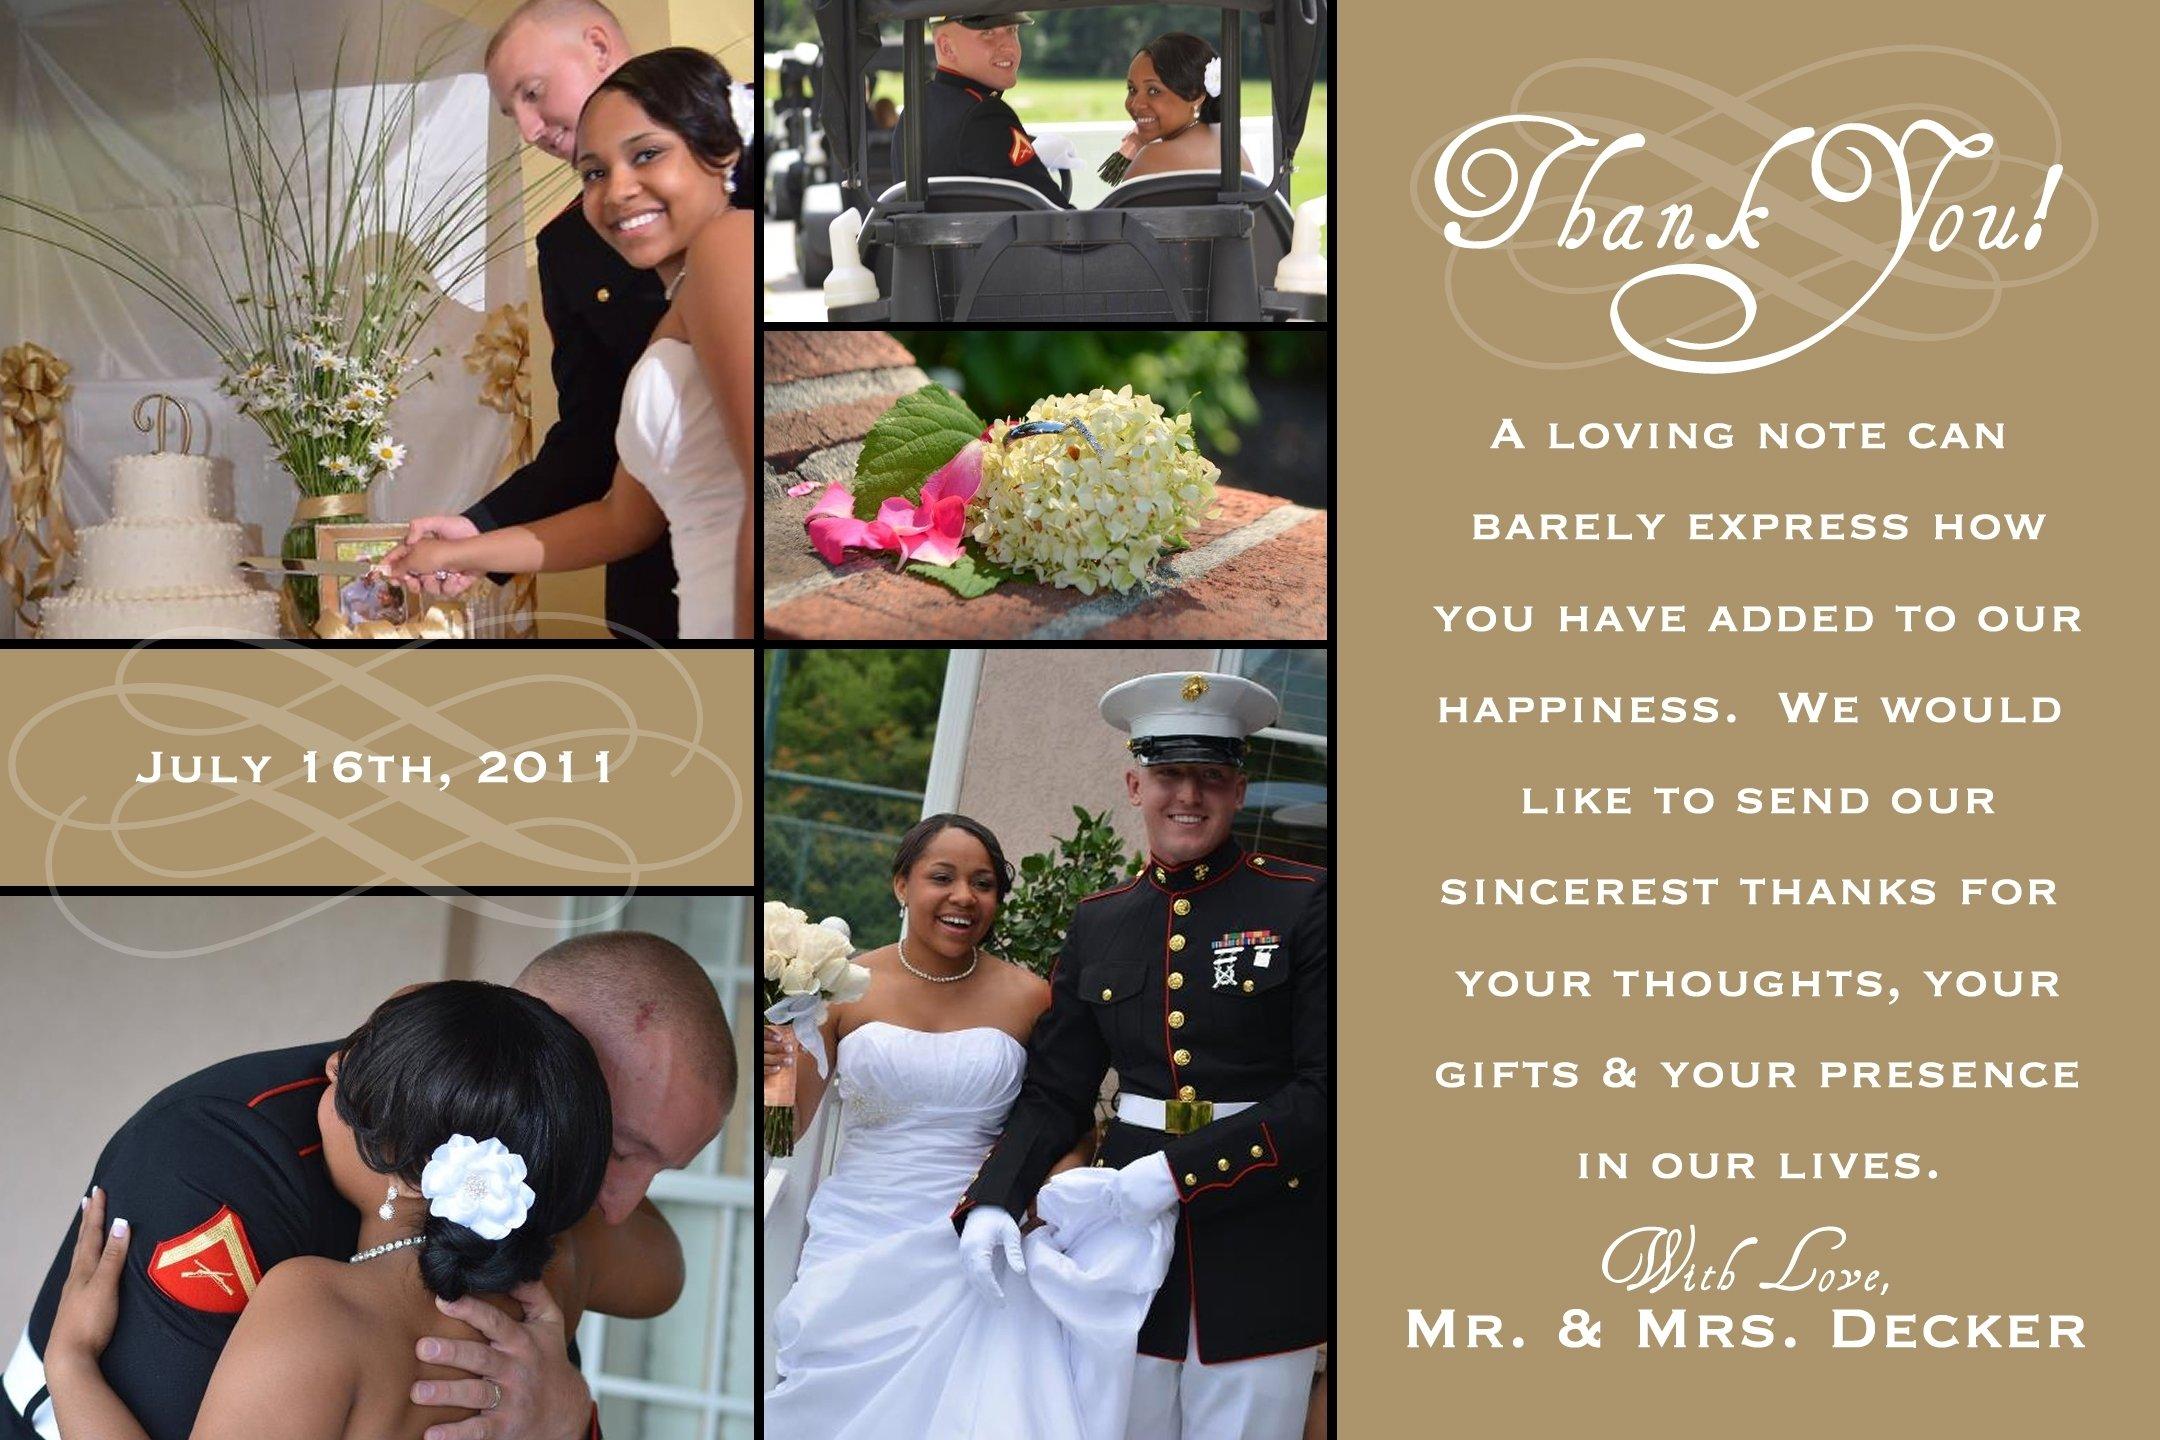 10 Lovely Wedding Thank You Card Ideas impressive wedding thank you wedding thank you card ideas 2020